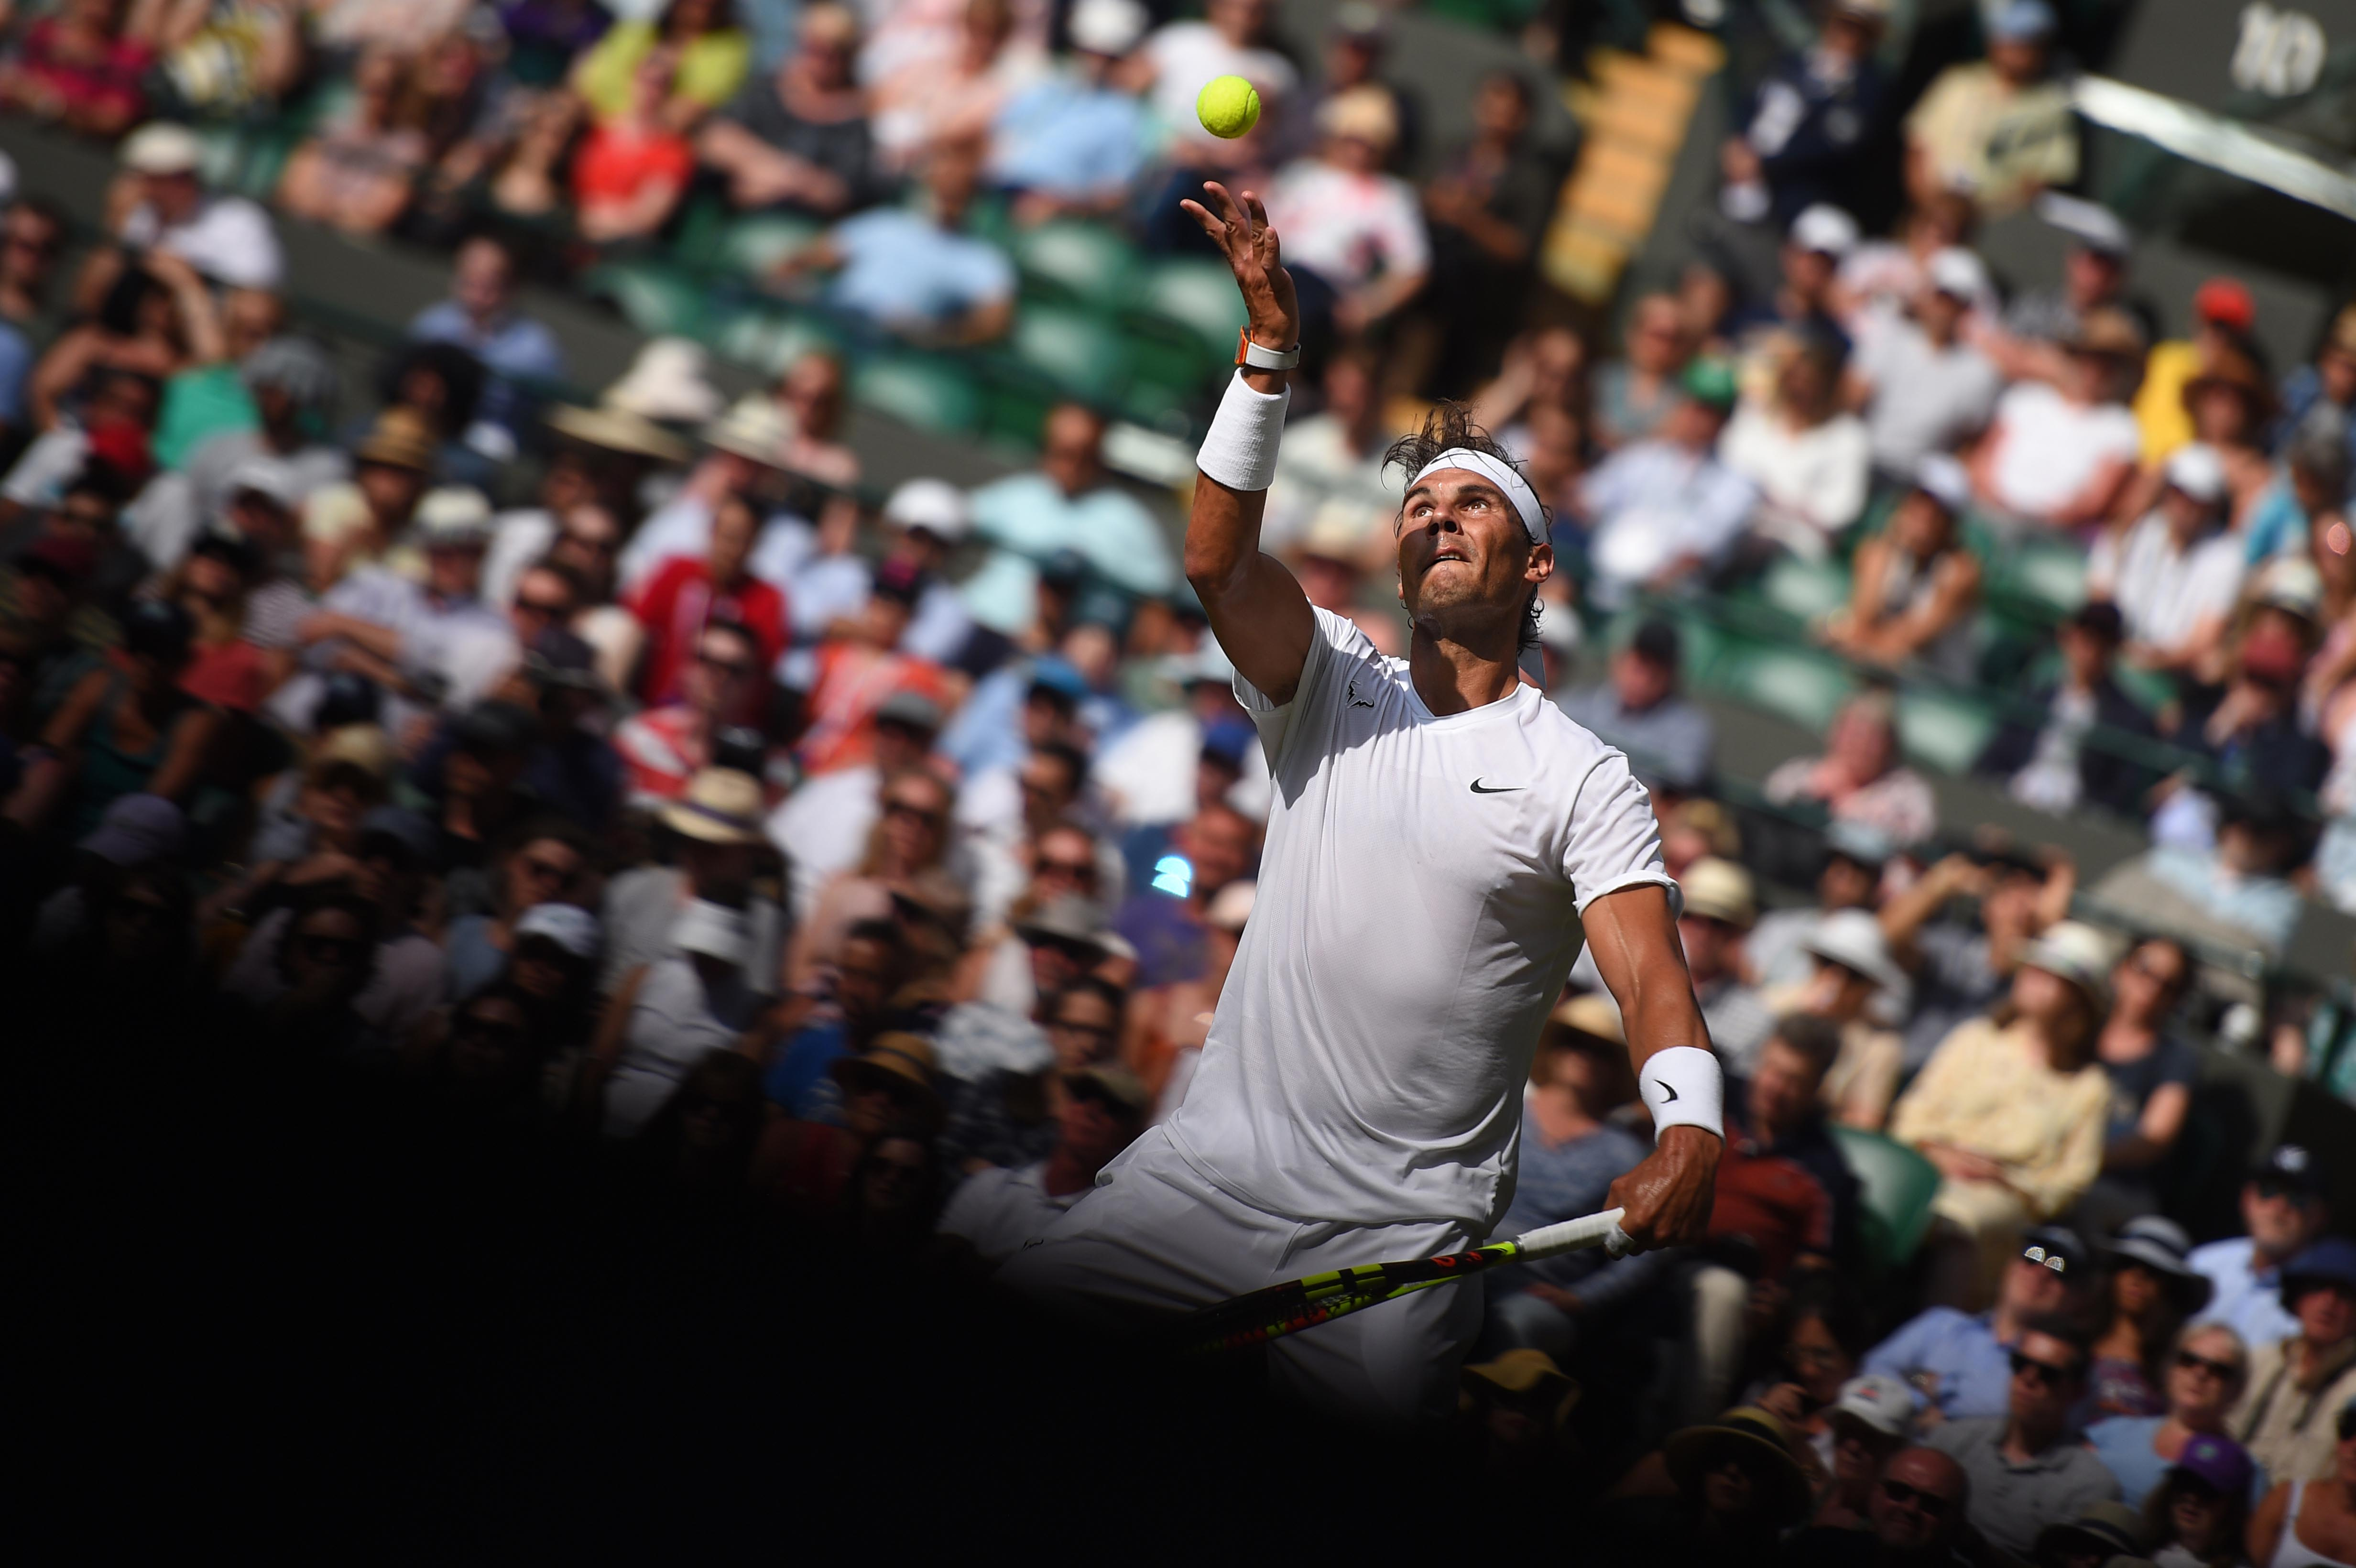 Rafael Nadal serving half in the light, half in the shadow Wimbledon 2019